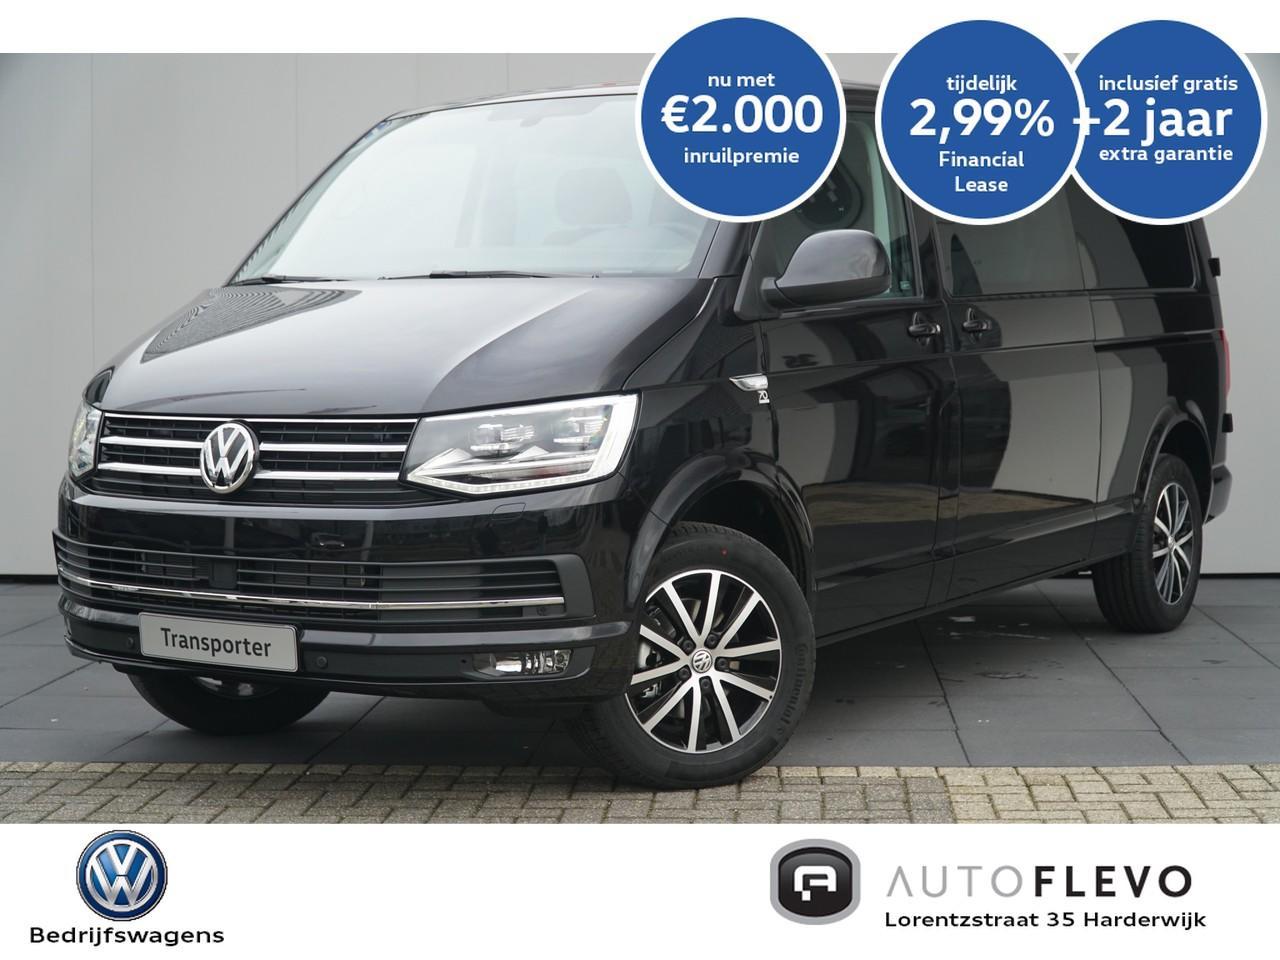 Volkswagen Transporter 2.0 tdi l2h1 dubbele cabine exclusive edition